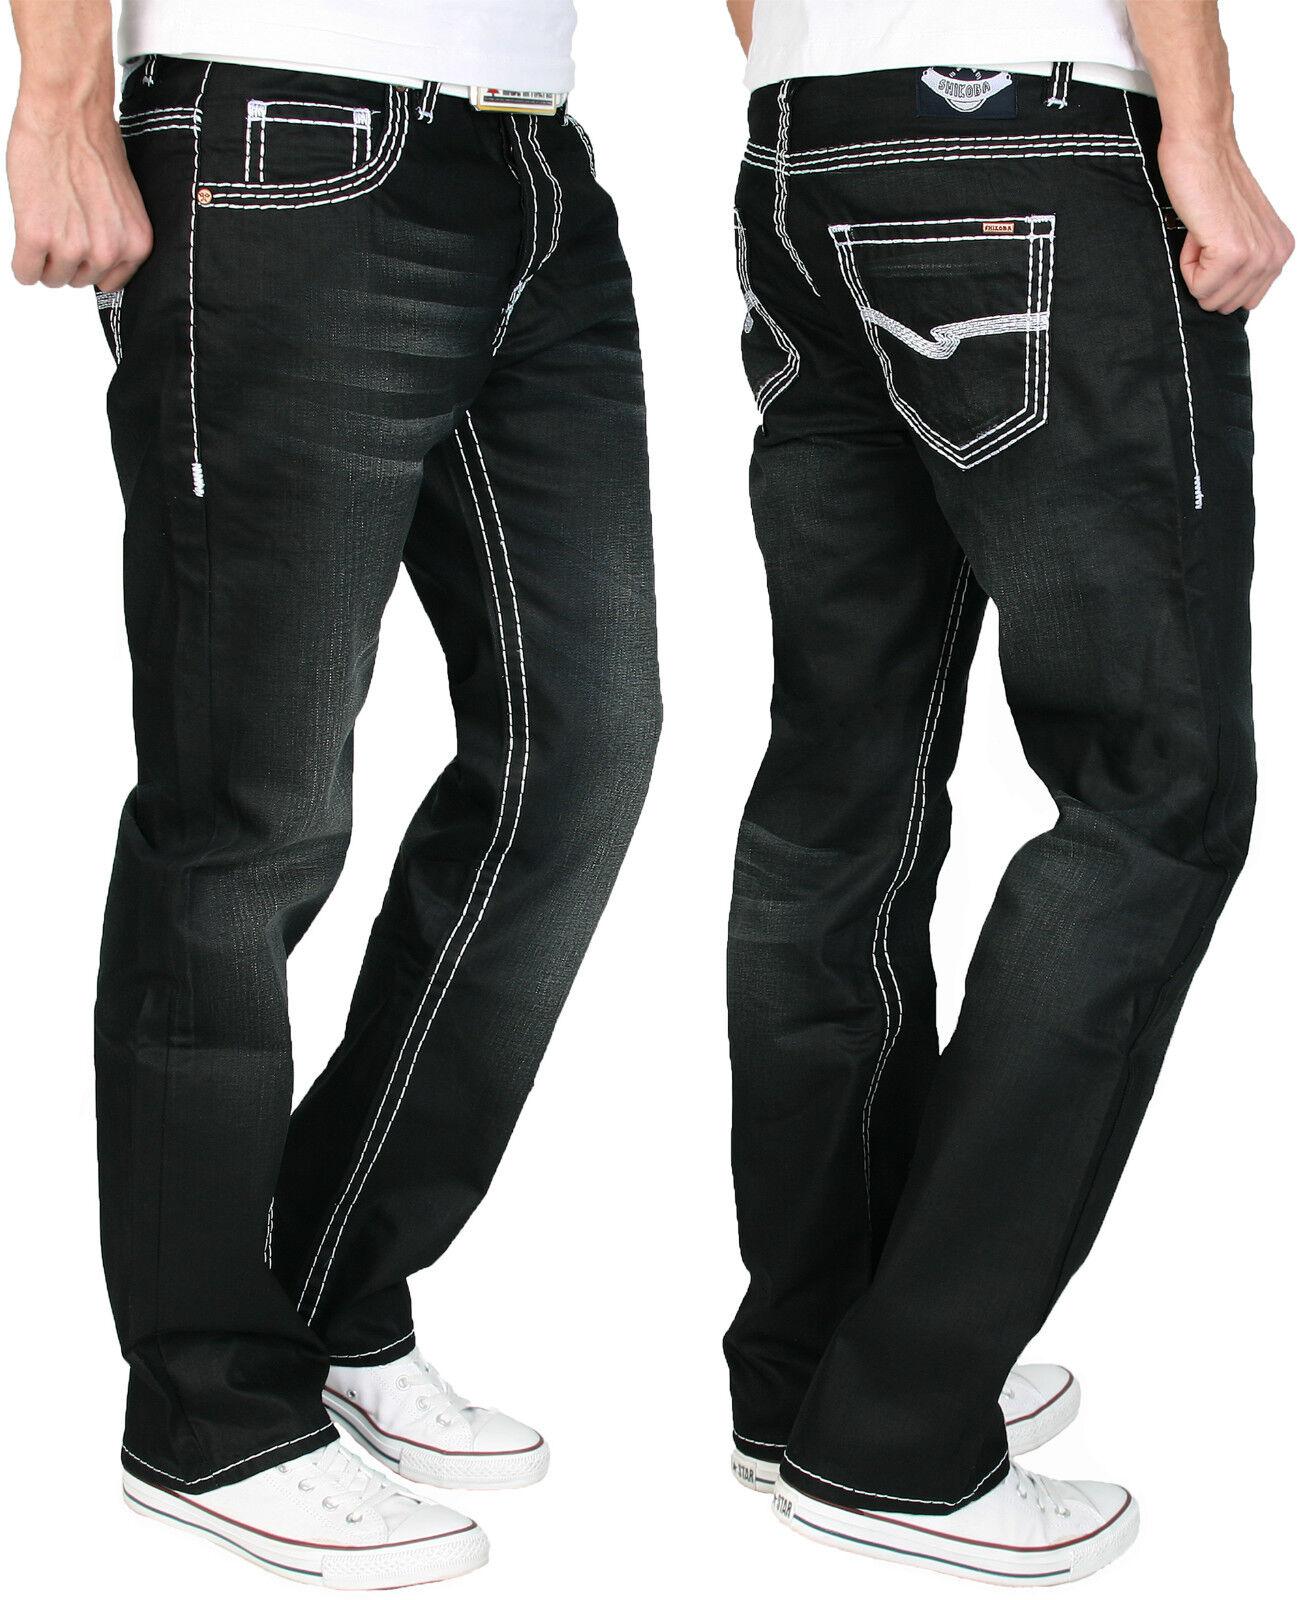 Shikoba Hombre Pantalones Vaqueros de Diseño Grueso whiteo Cosido Denim black